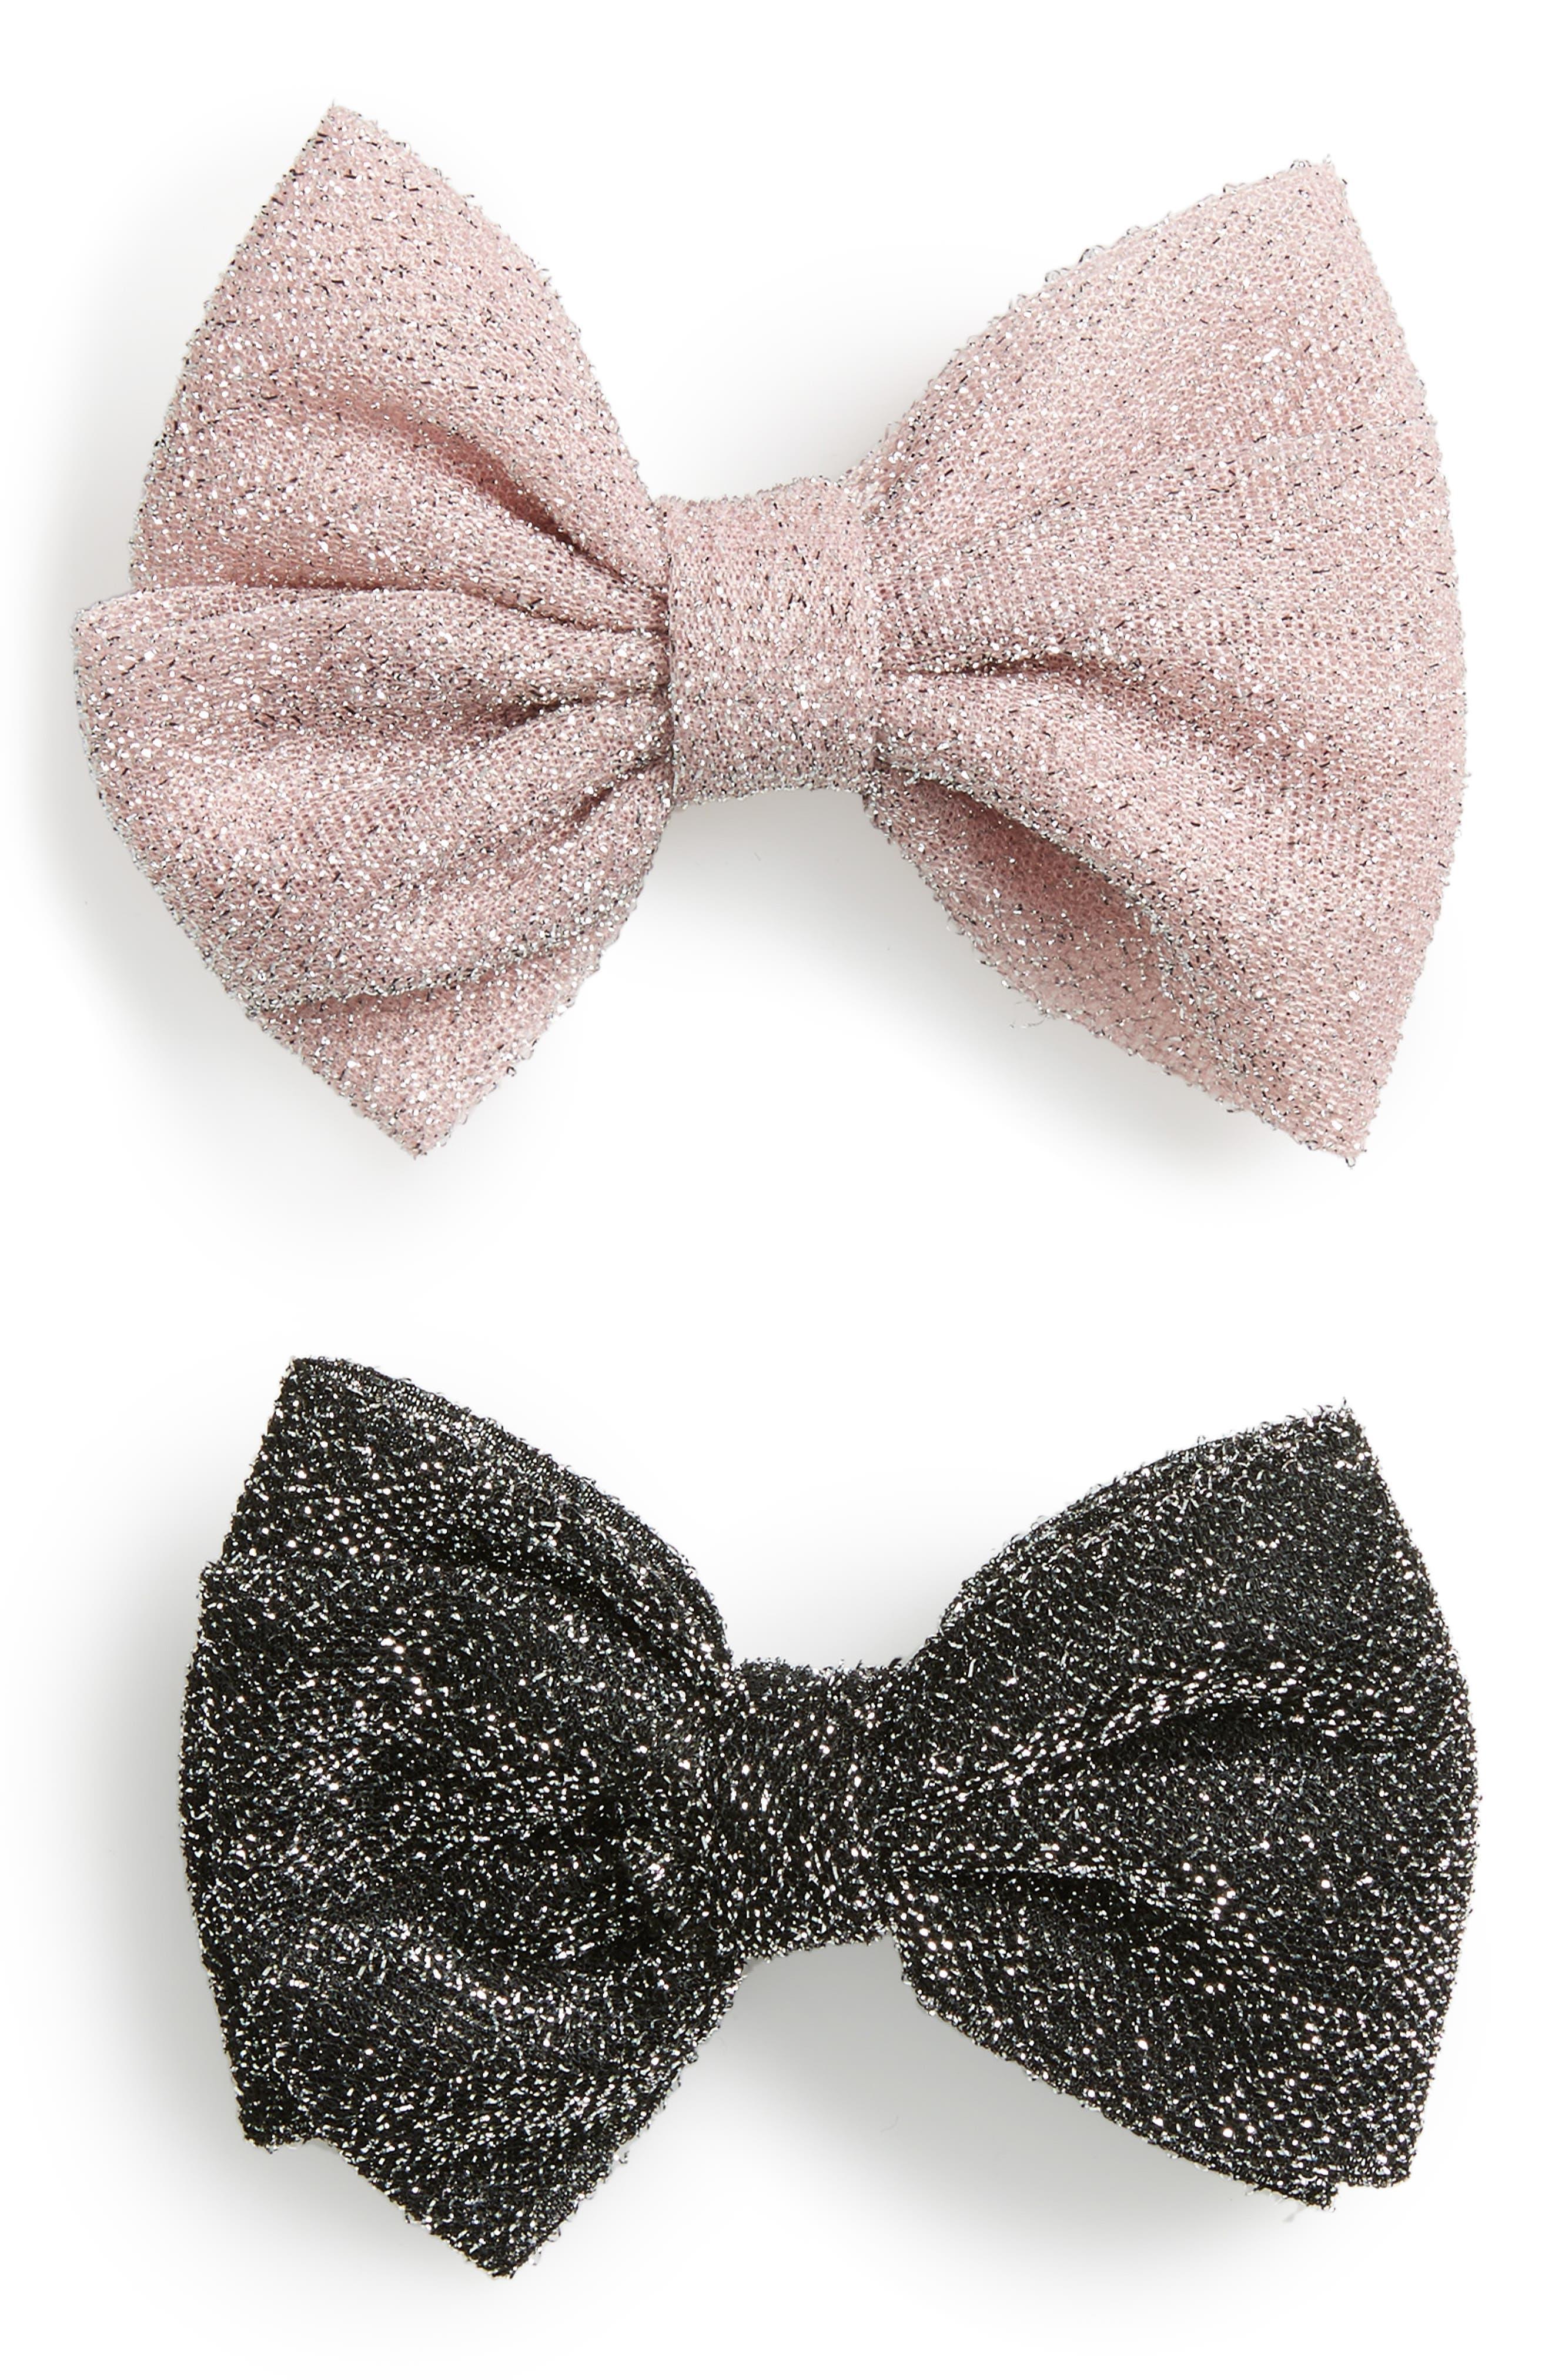 Set of 2 Glitter Bows,                         Main,                         color, Black/Pink